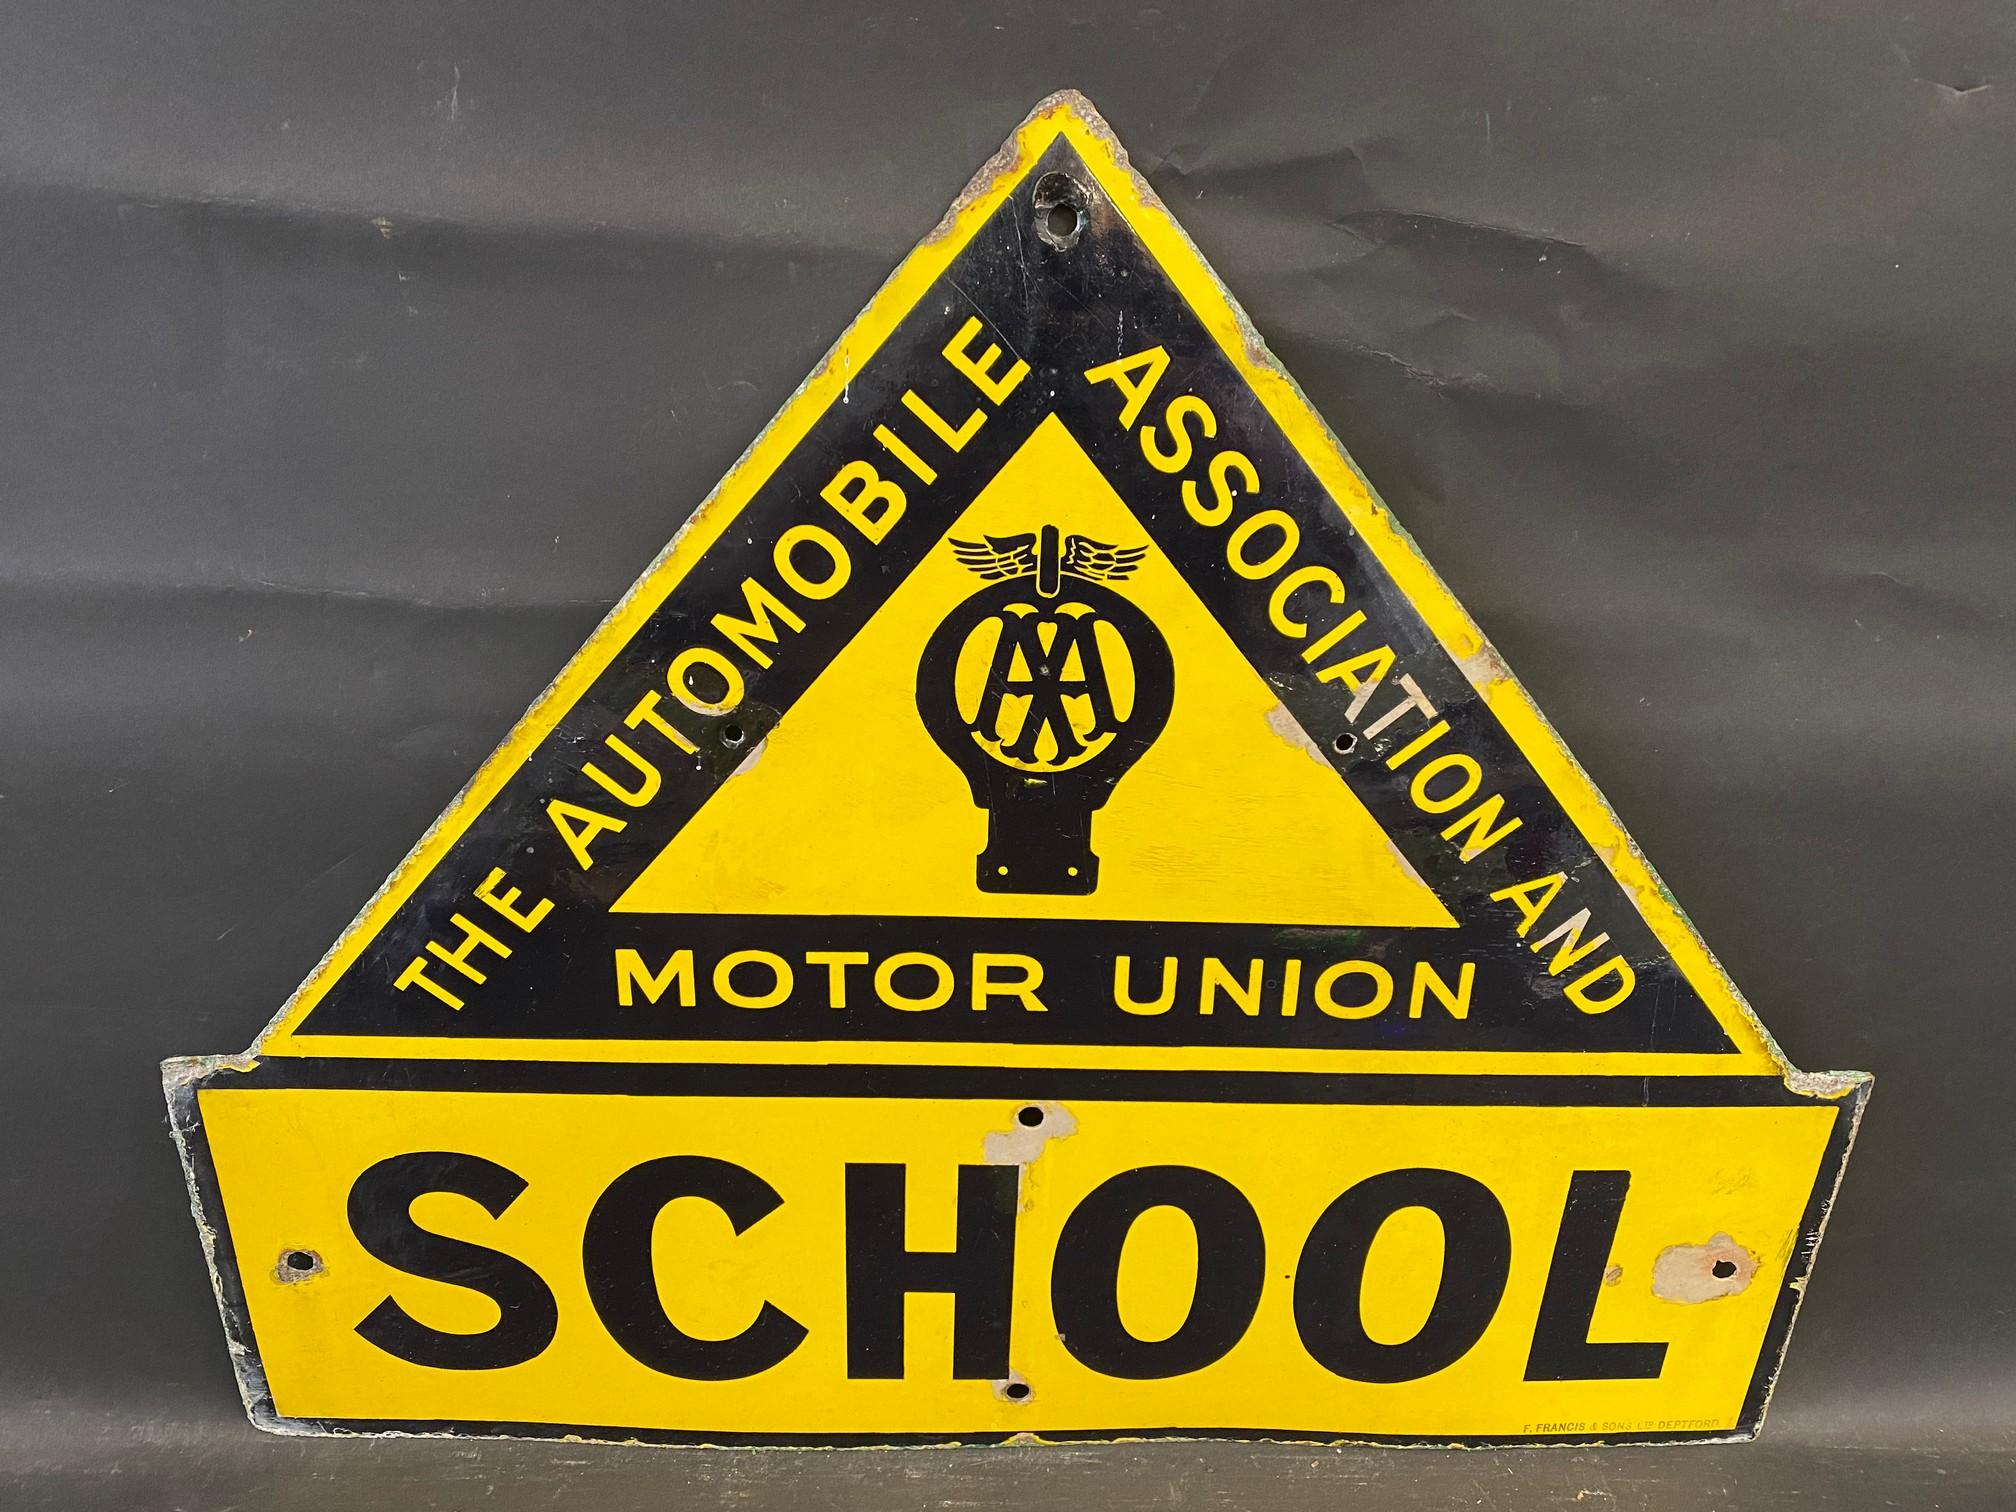 "An AA & Motor Union School enamel road sign by F. Francis & Sons Ltd. of Deptford, 21 1/2 x 26""."